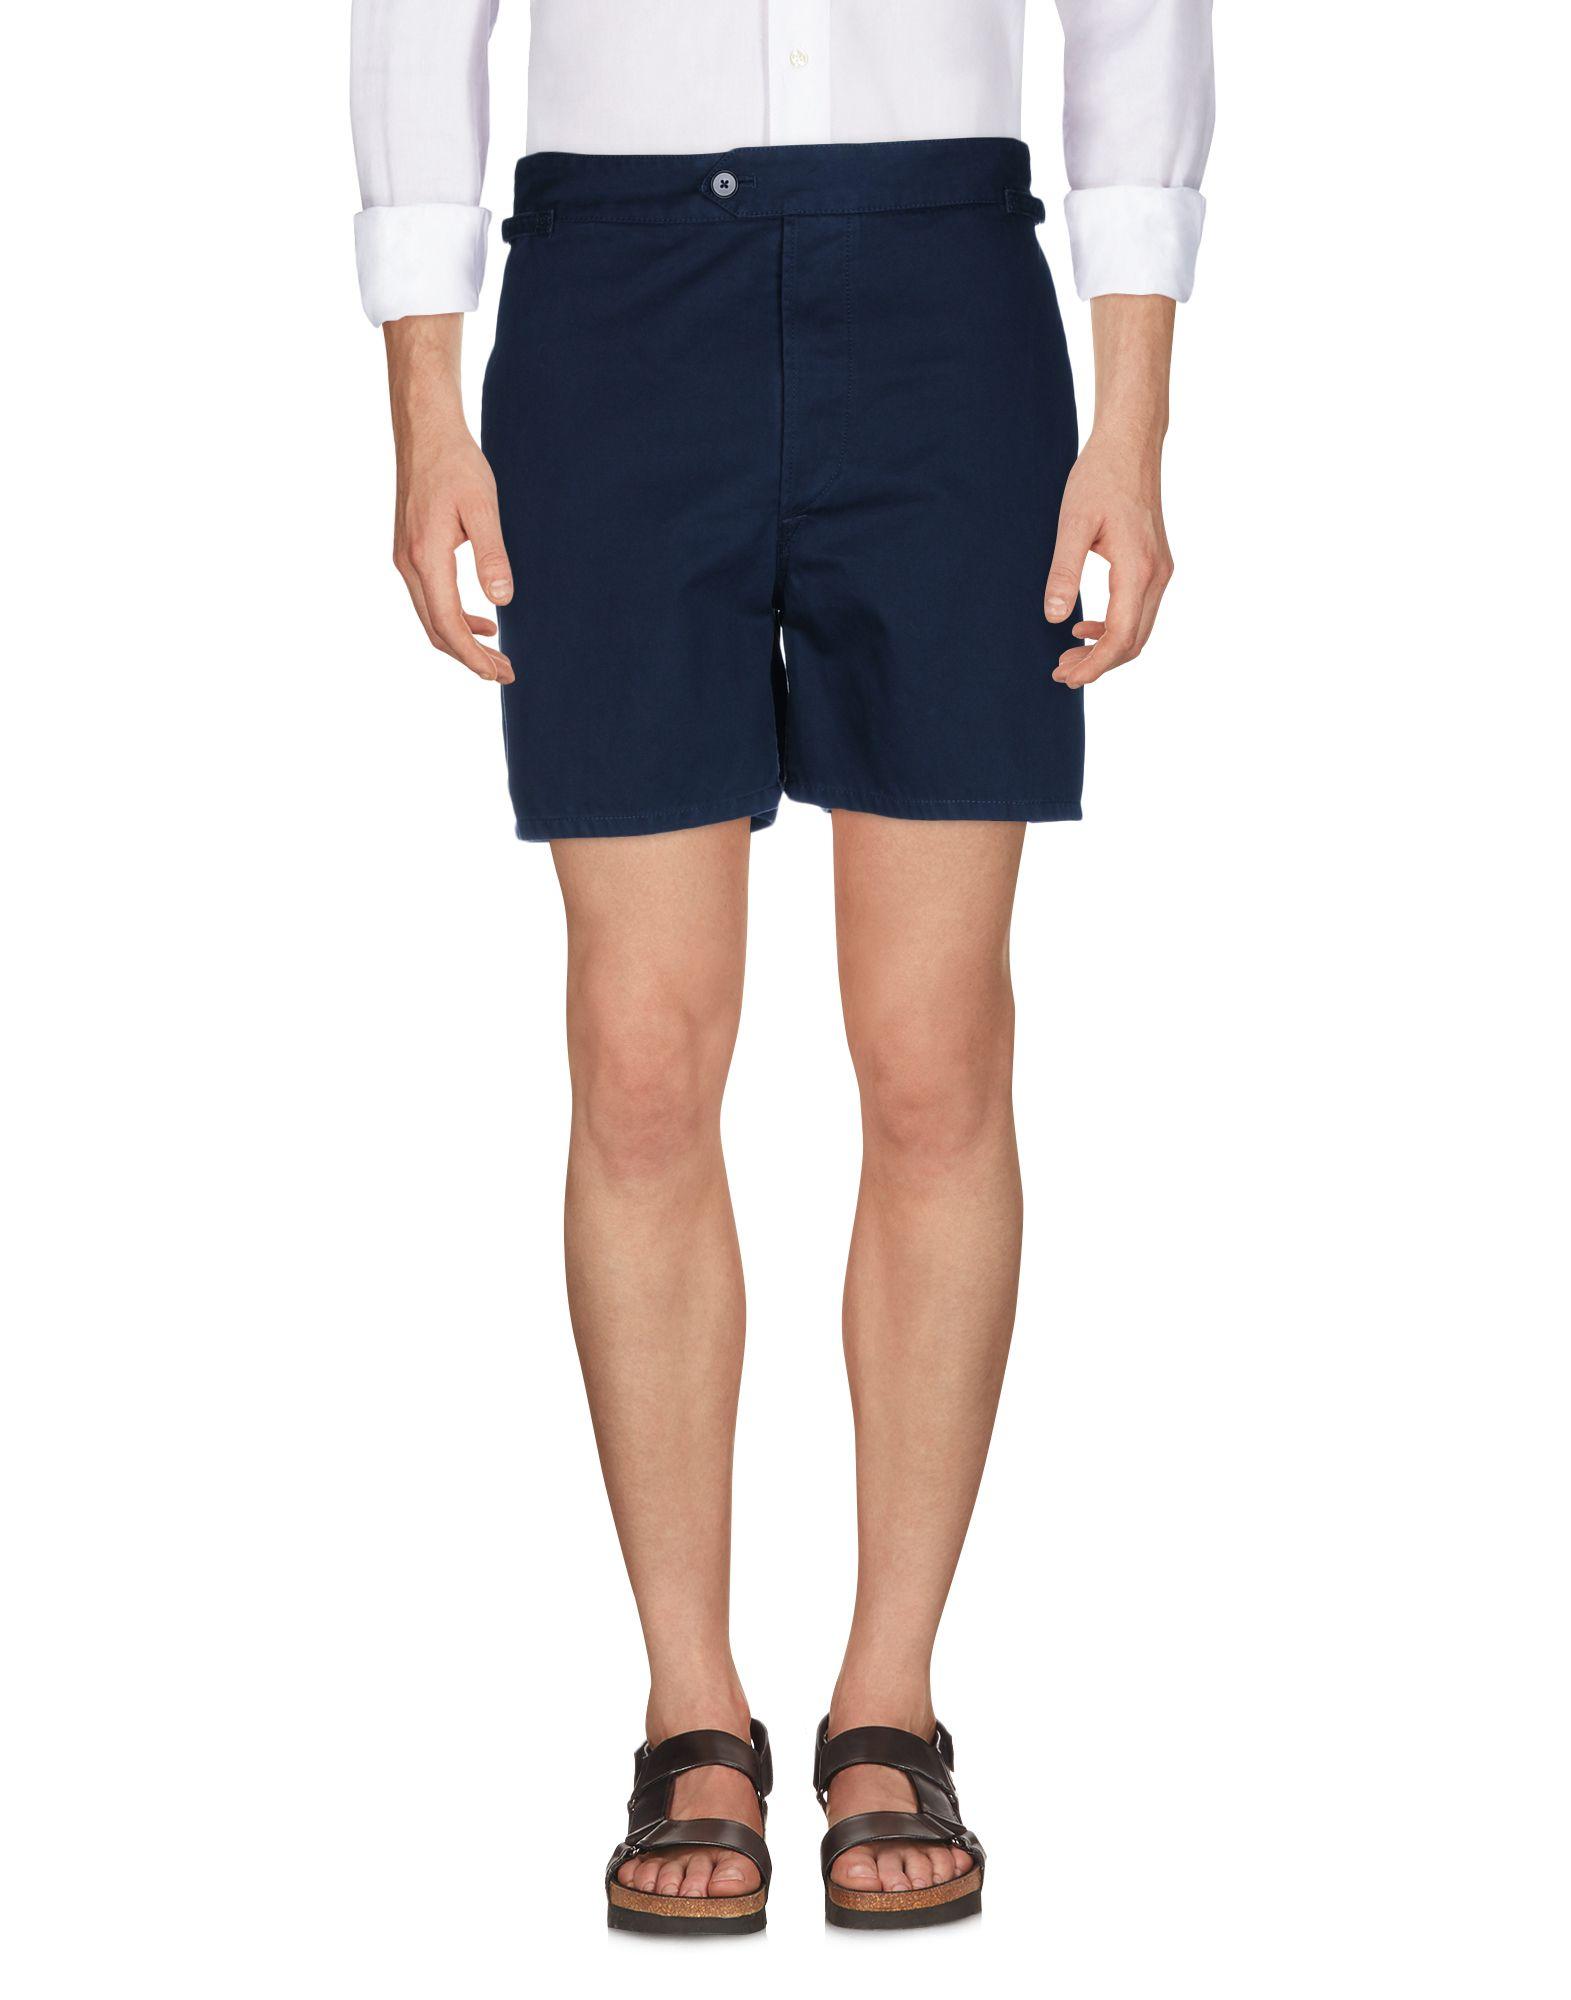 Shorts & Bermuda Maison Margiela Uomo - - Uomo 13091148DA ad8cd0